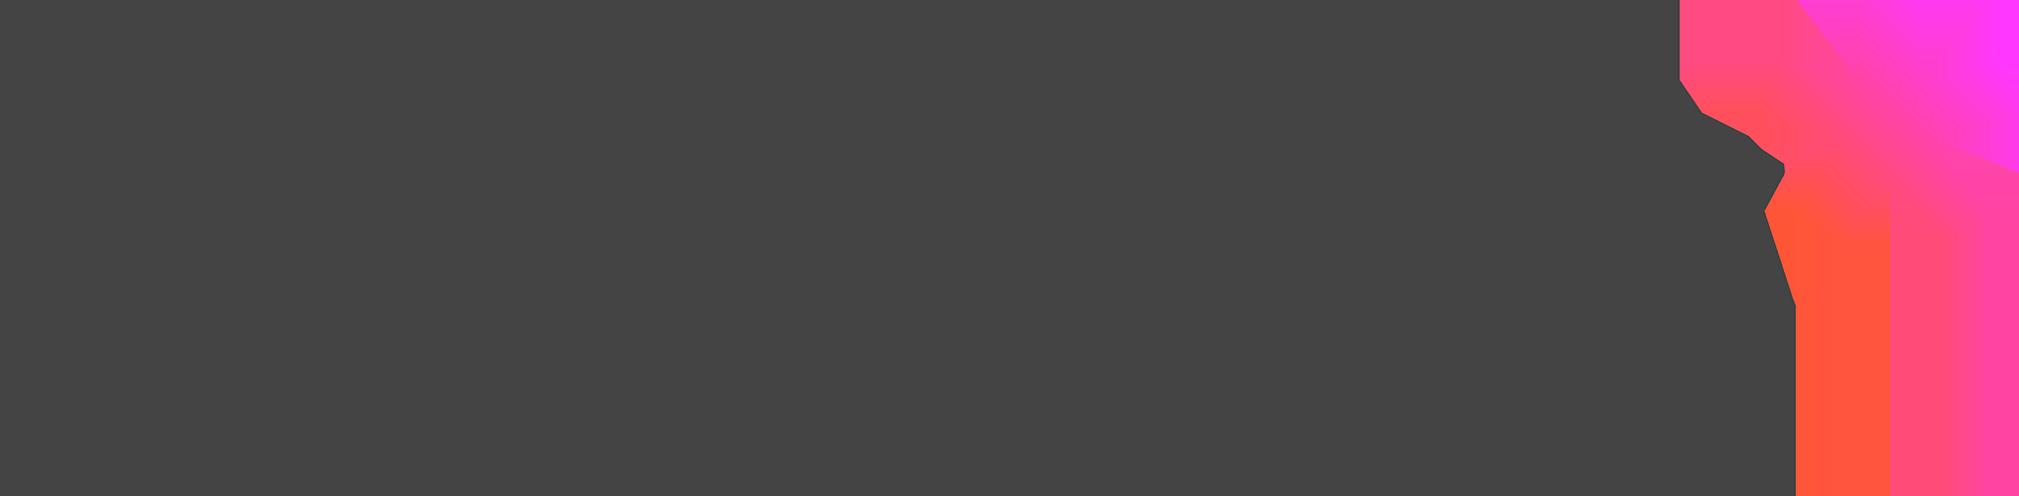 Spaceboy Footer Logo